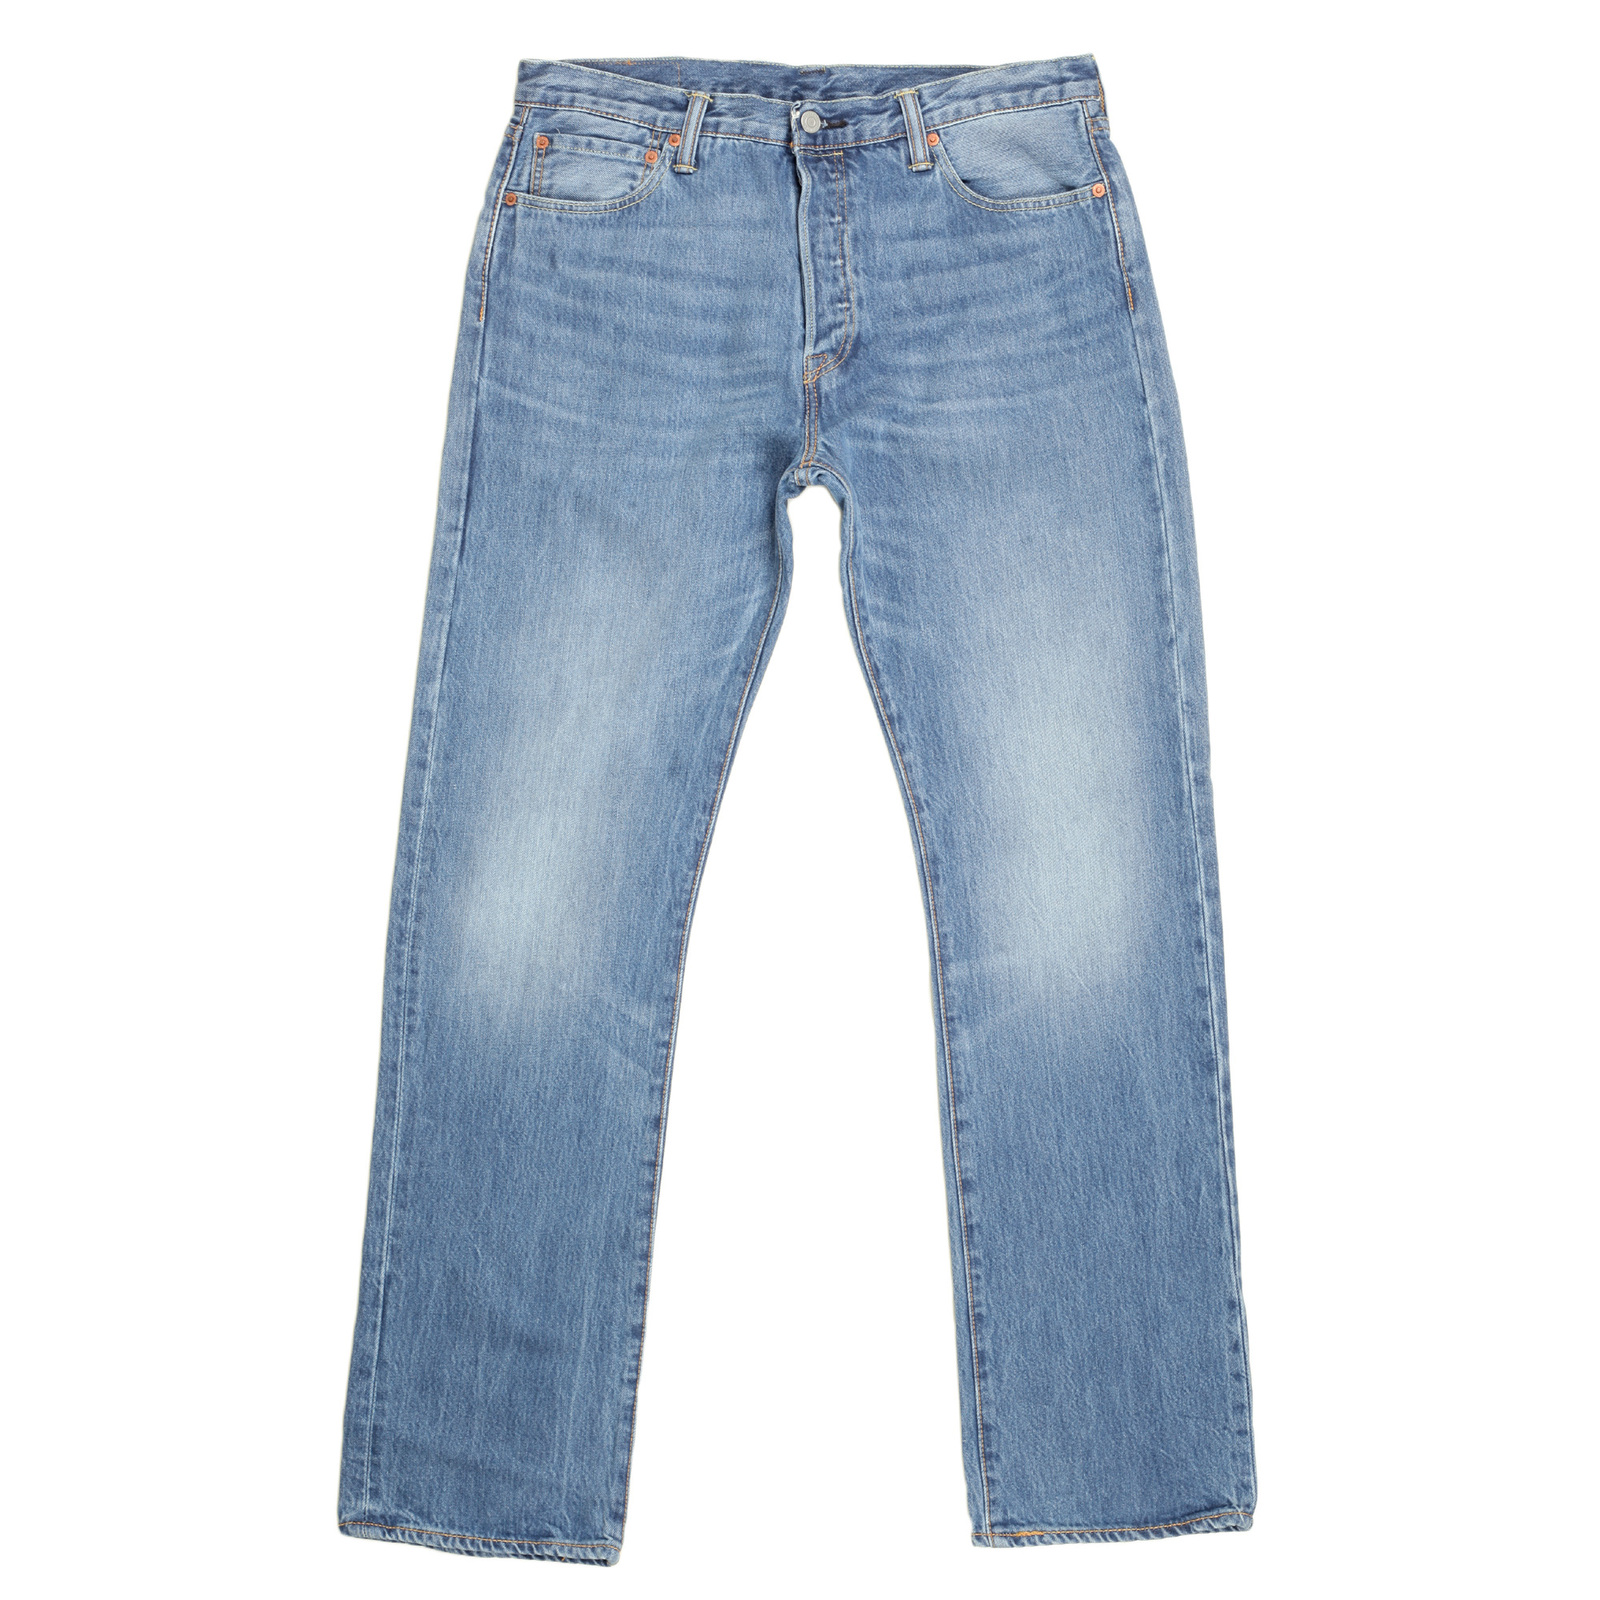 Buy Levis 501 Original Fit Jeans In Washed Light Blue